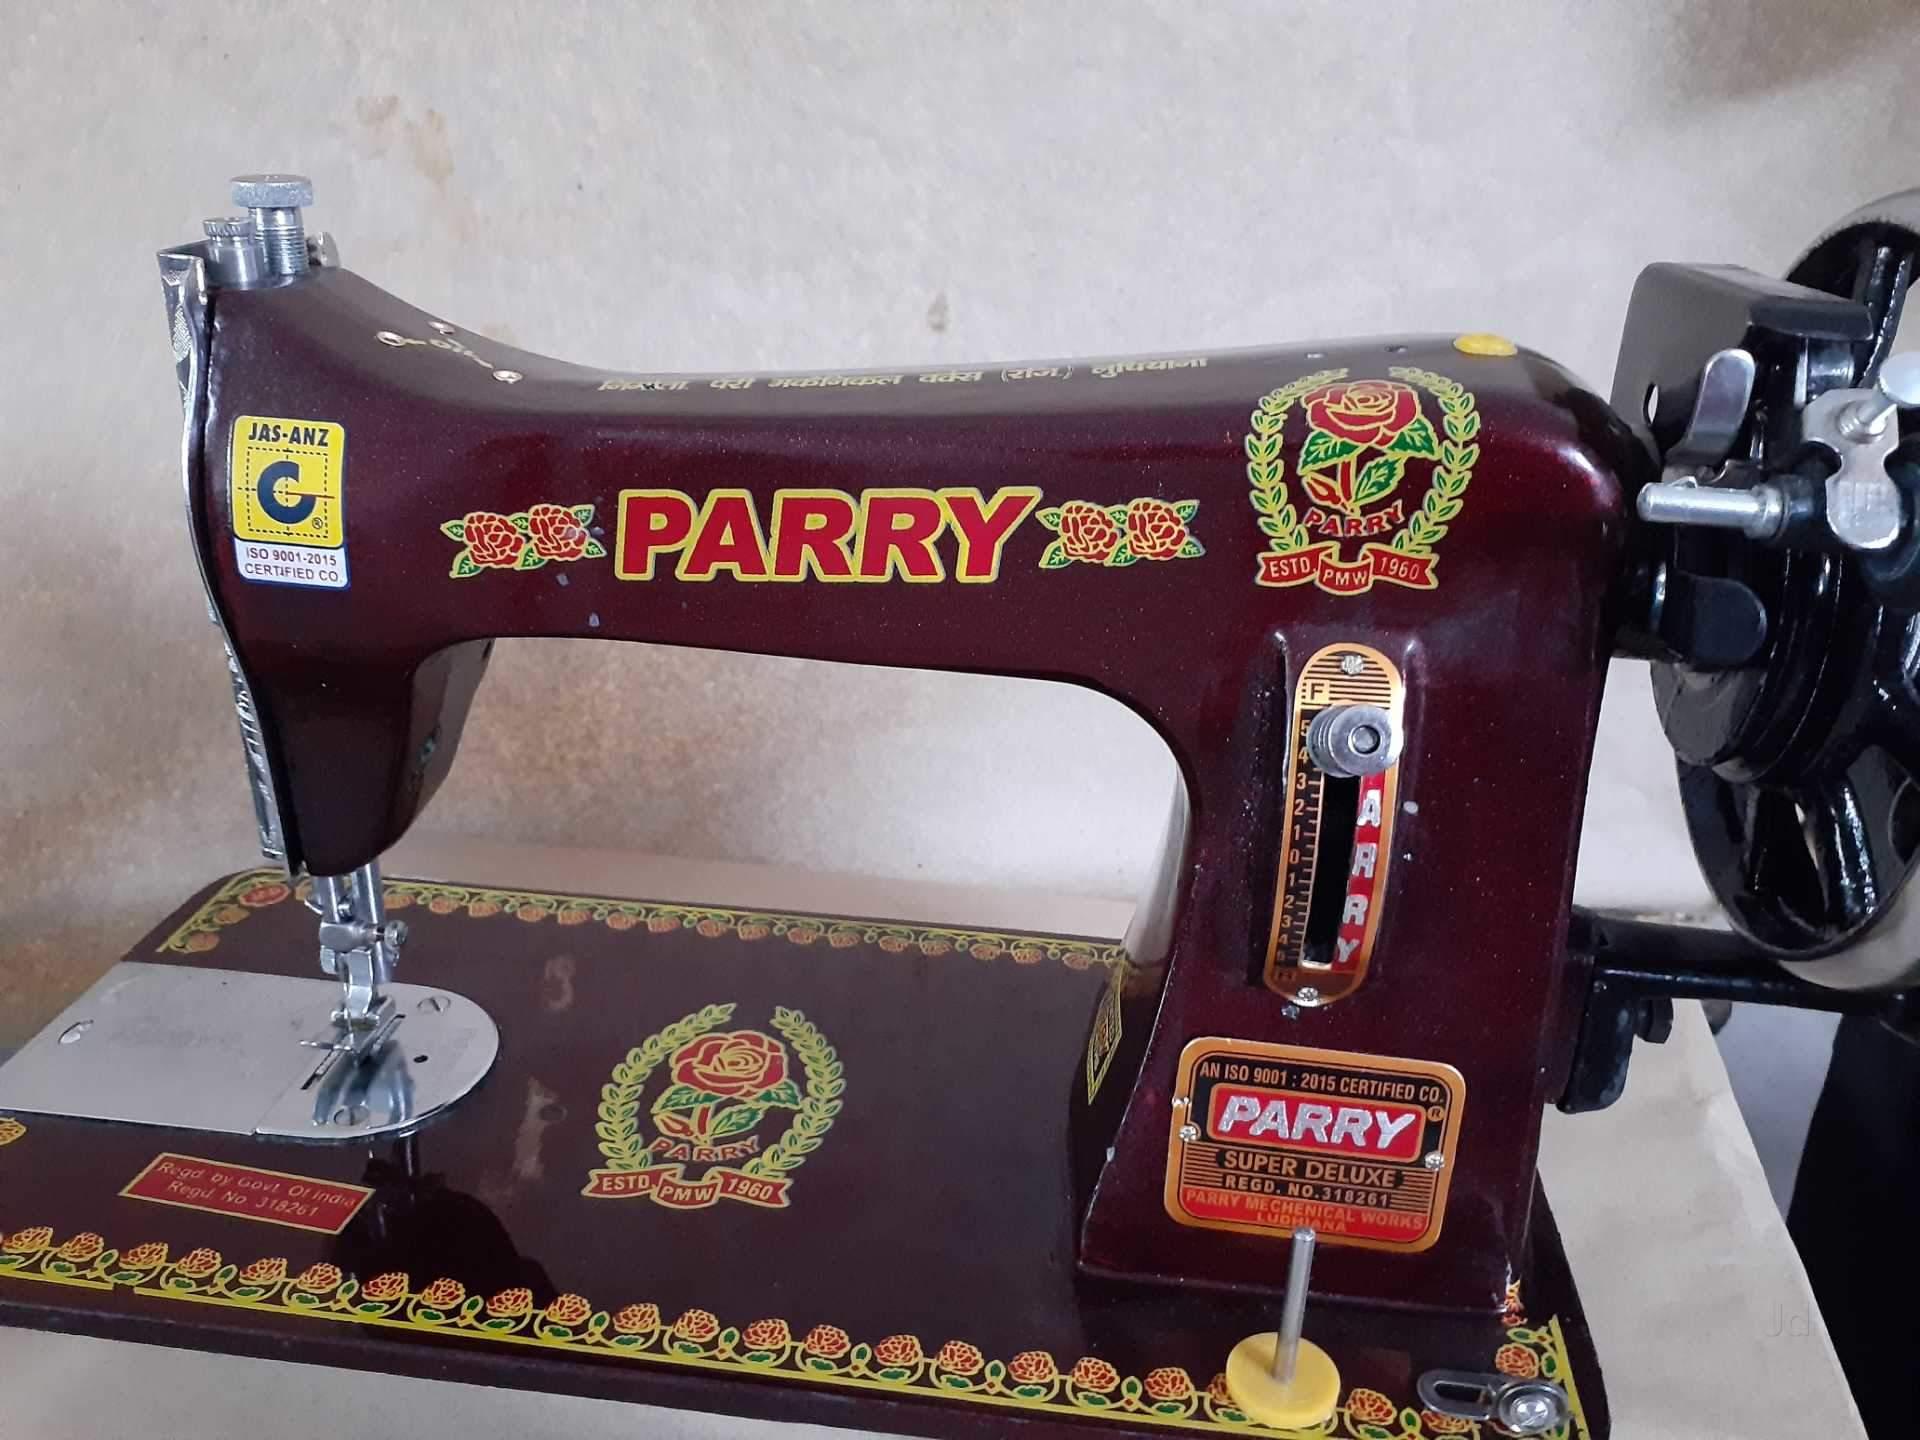 Top 100 Sewing Machine Manufacturers in Ludhiana - Best